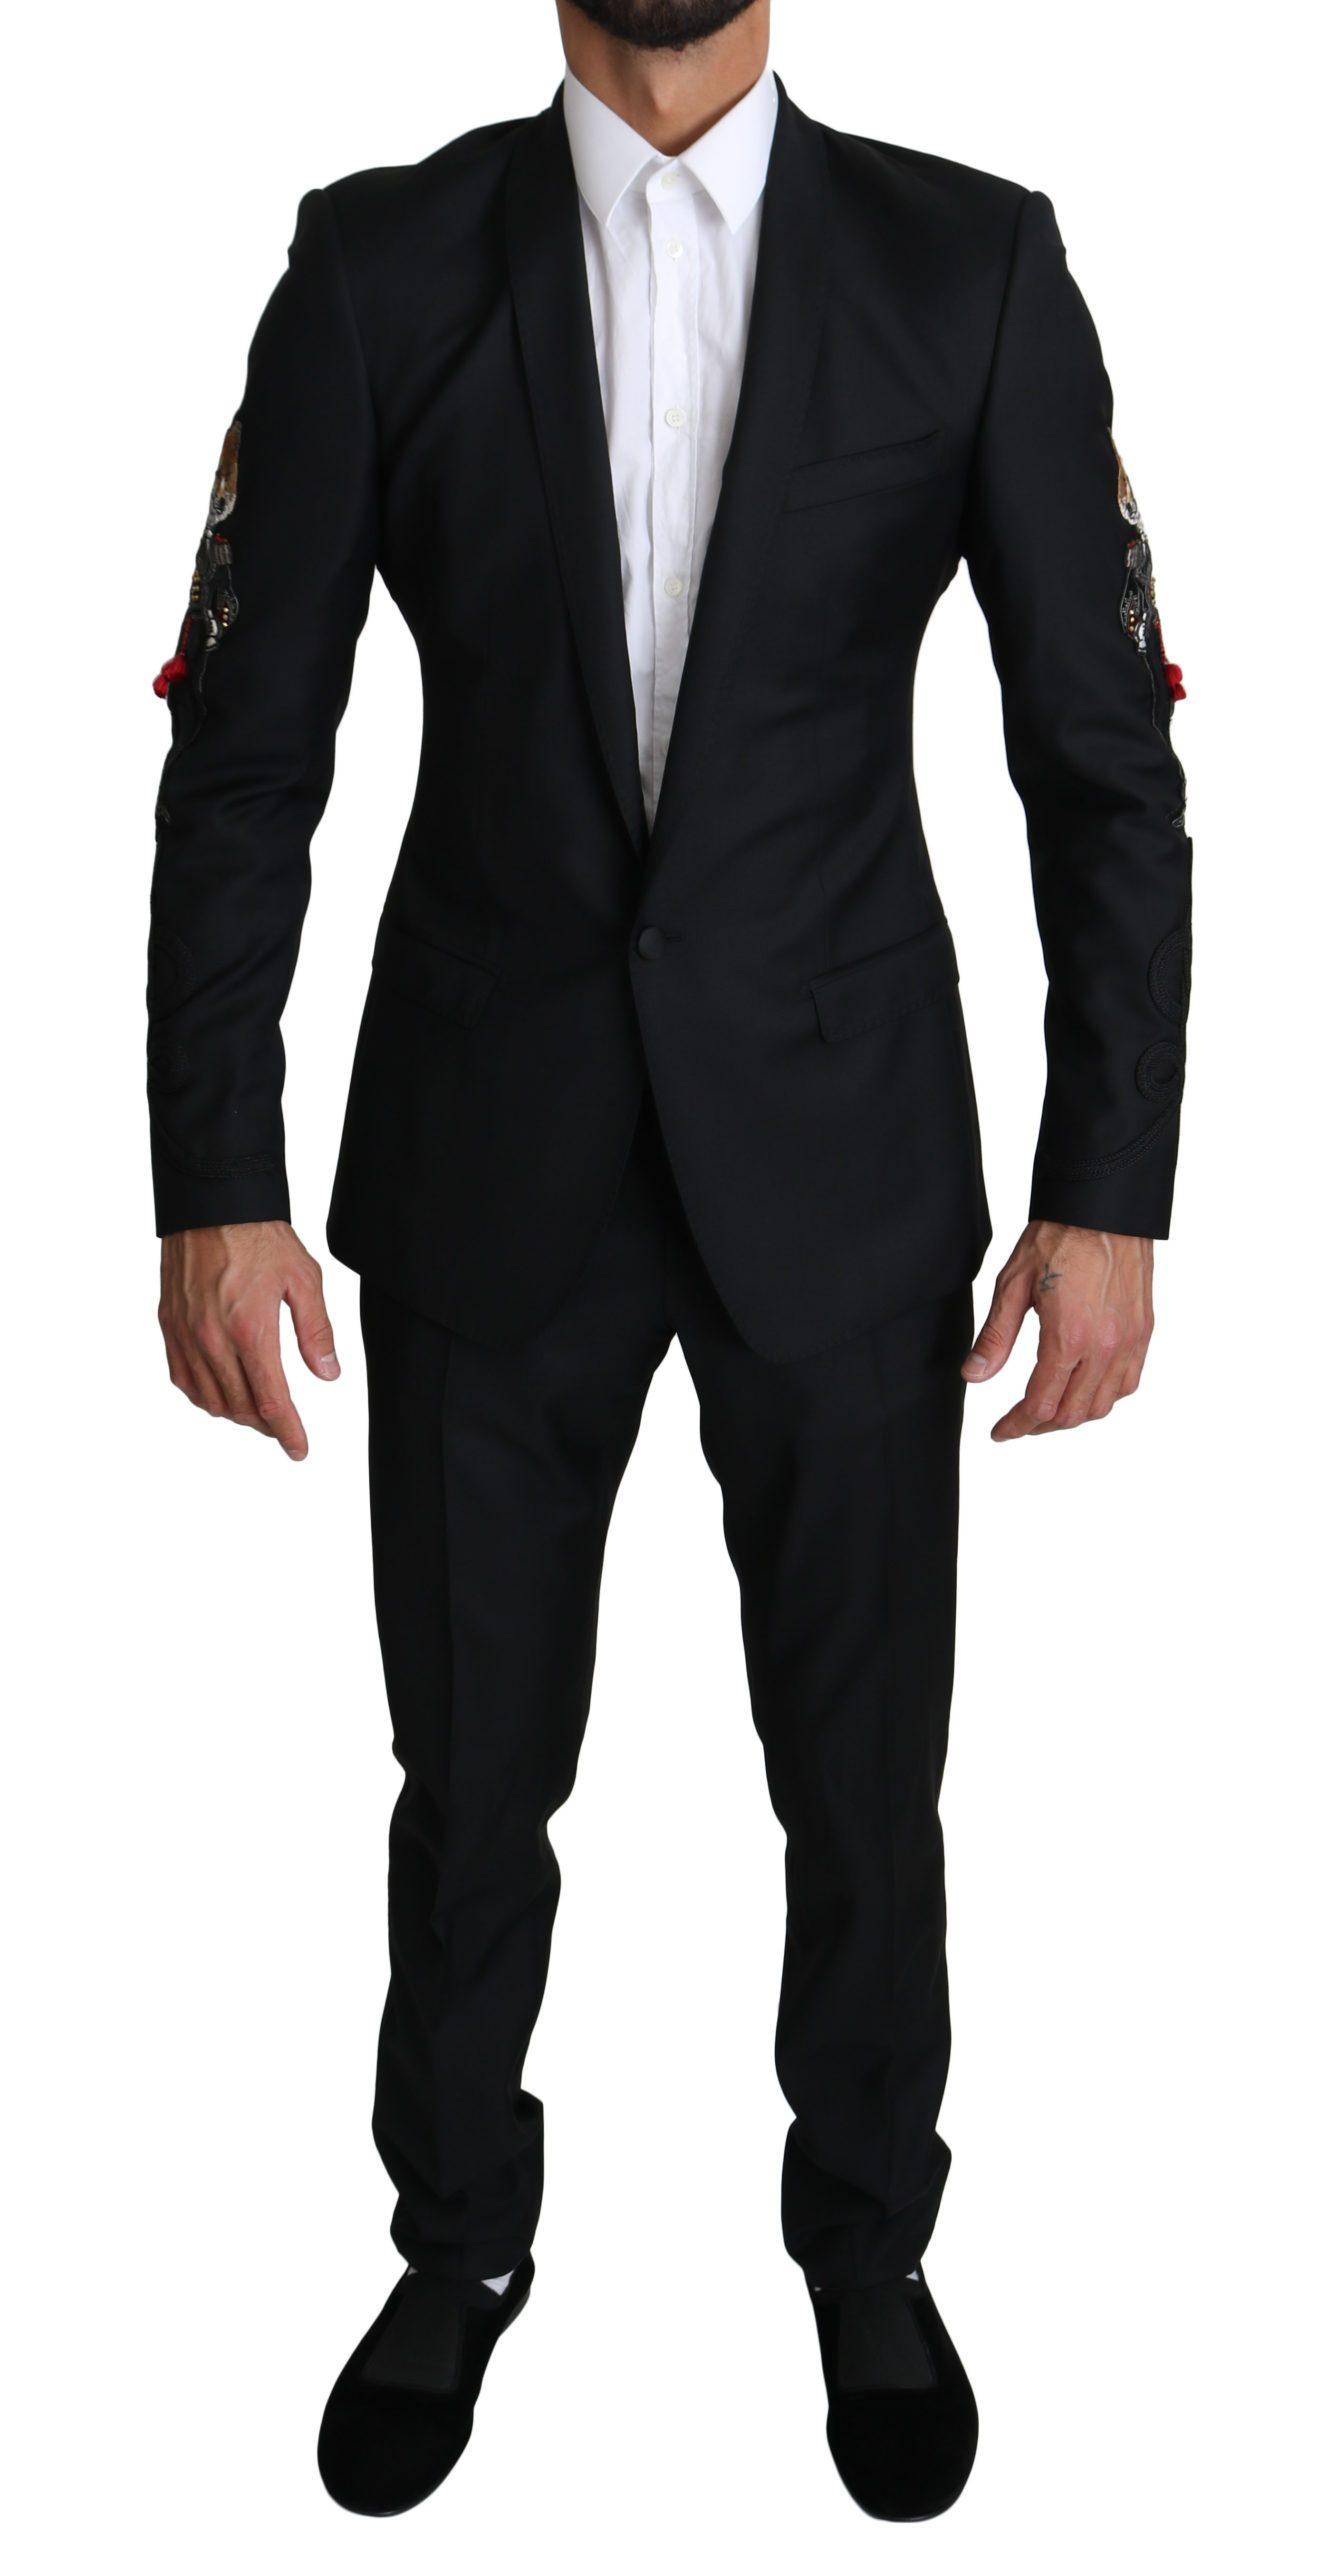 Dolce & Gabbana Men's 2 Piece FOX Embroidered Suit Gold Black KOS1530 - IT46 | S